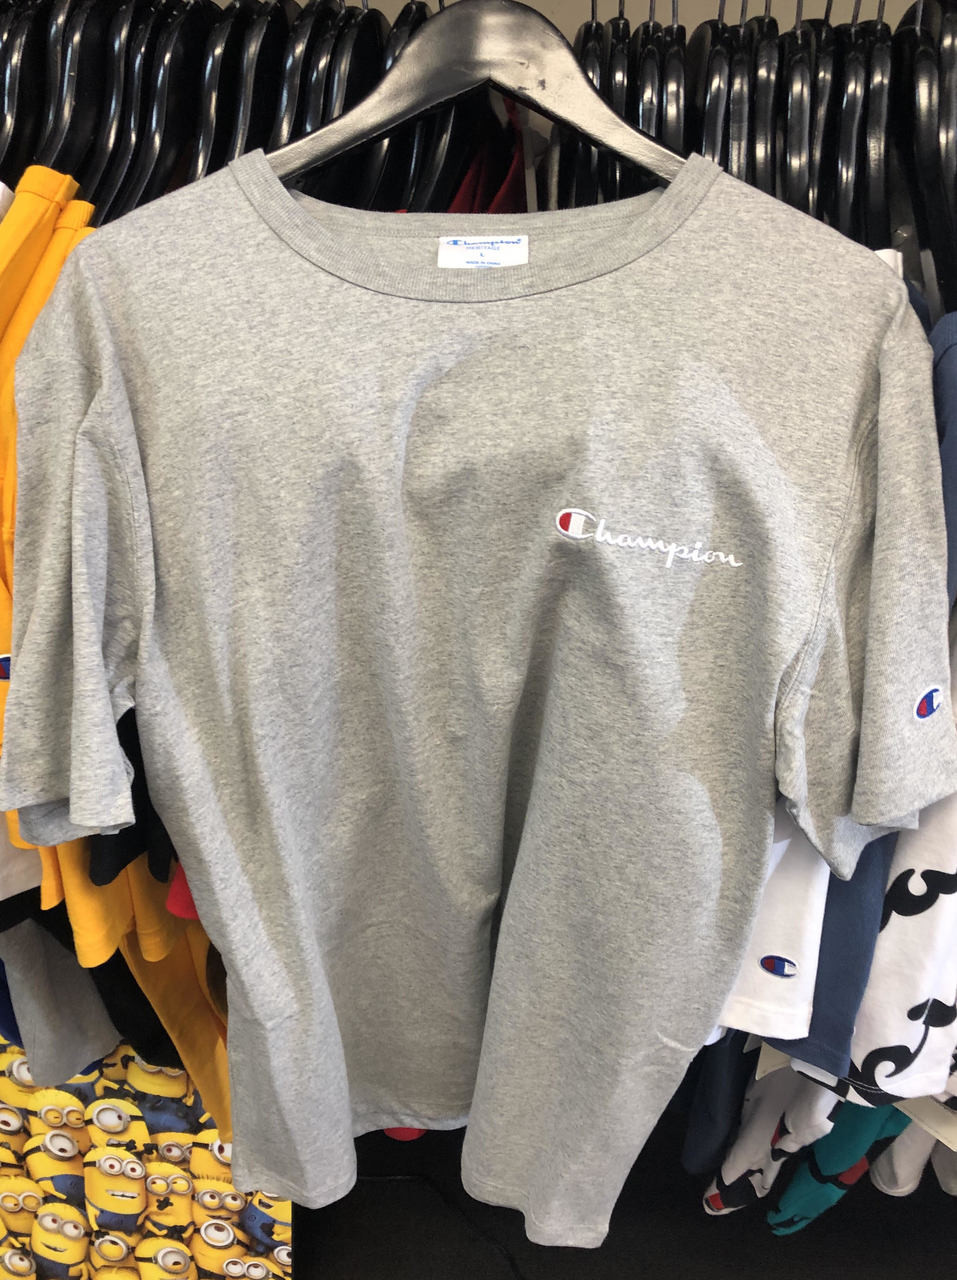 32f2135cae8 Champion Clothing. $47.18. Champion Heritage Small Script Grey T-Shirt